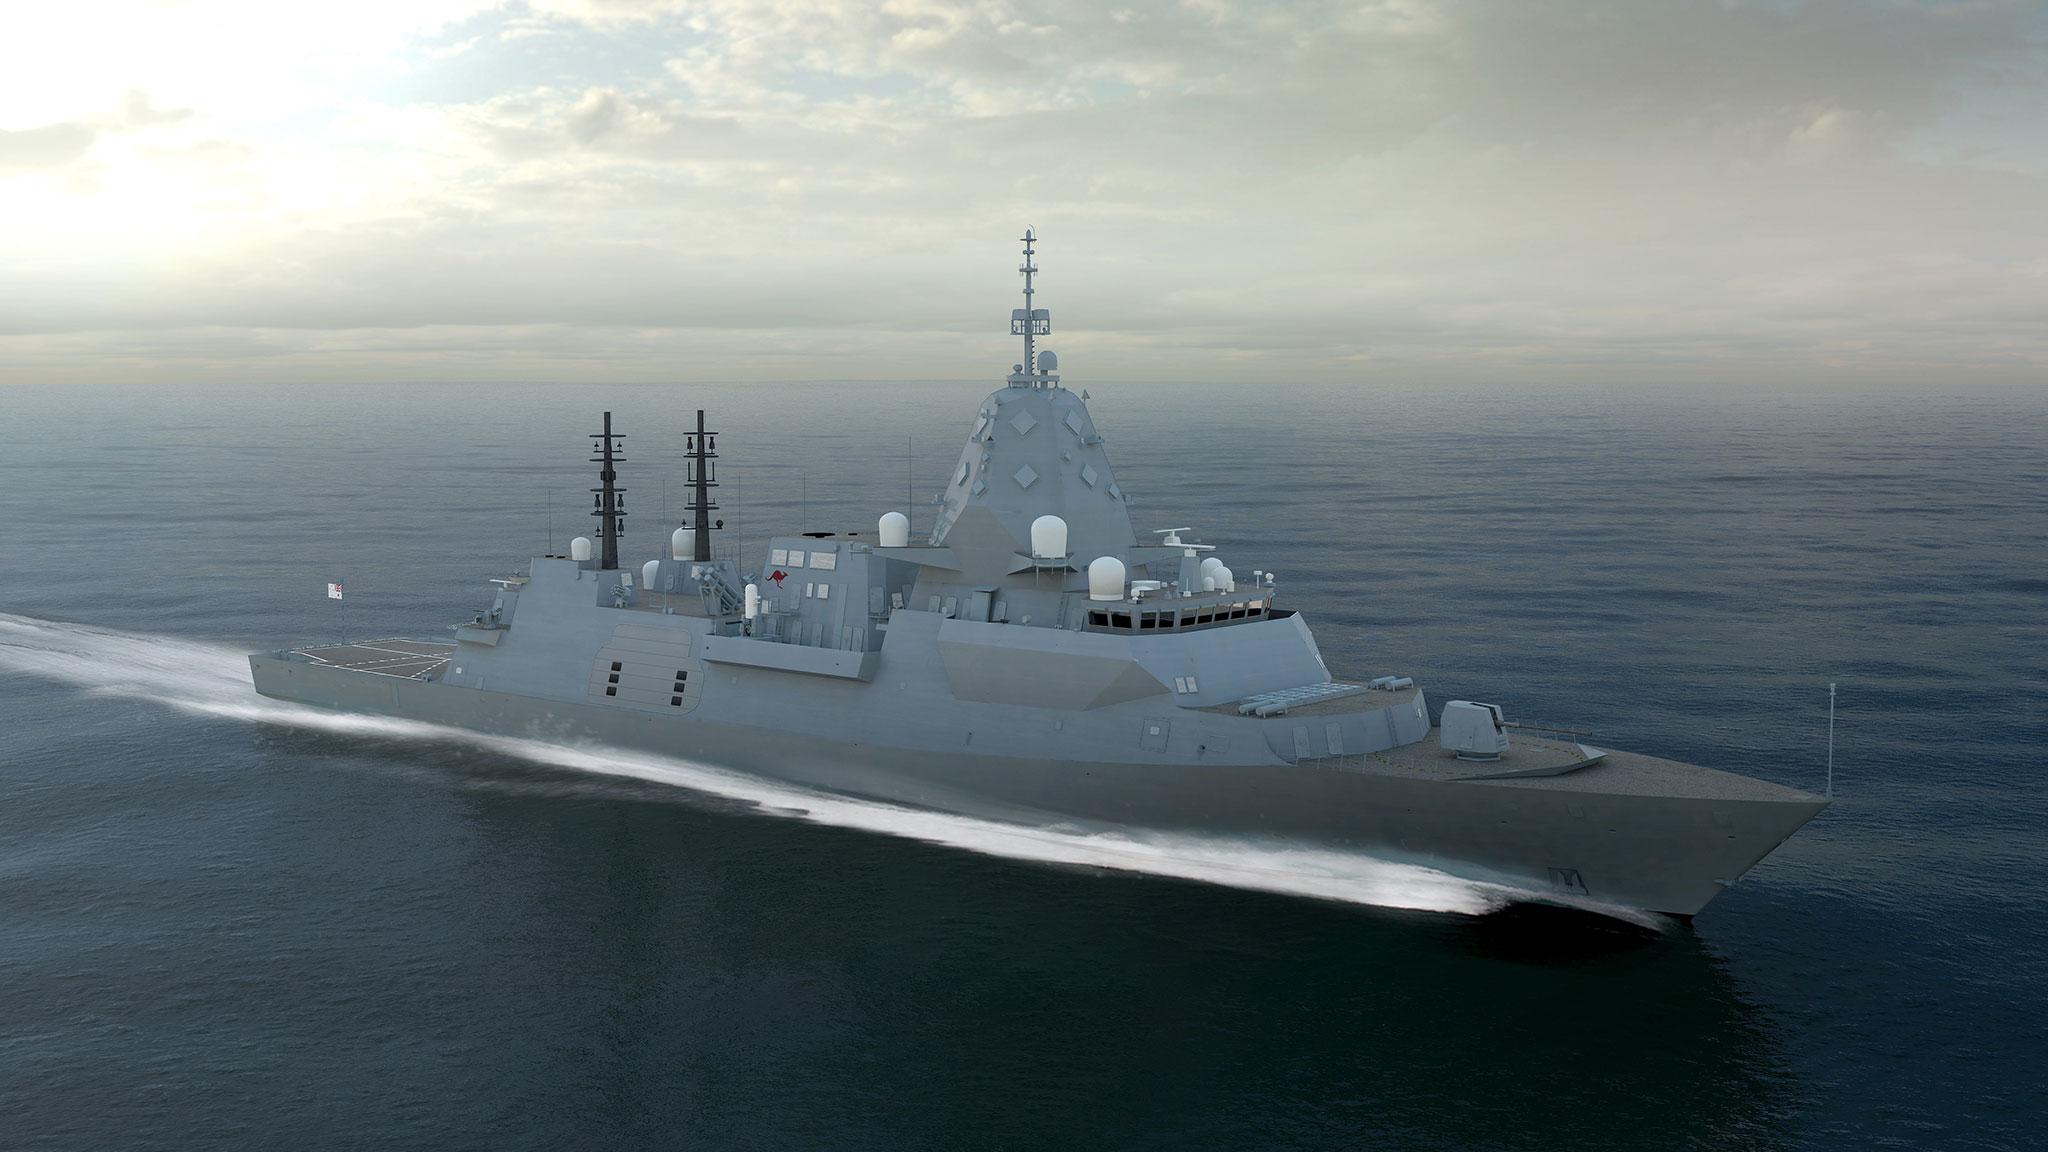 Type 26 Frigate >> Australia targets arms exports amid defence splurge